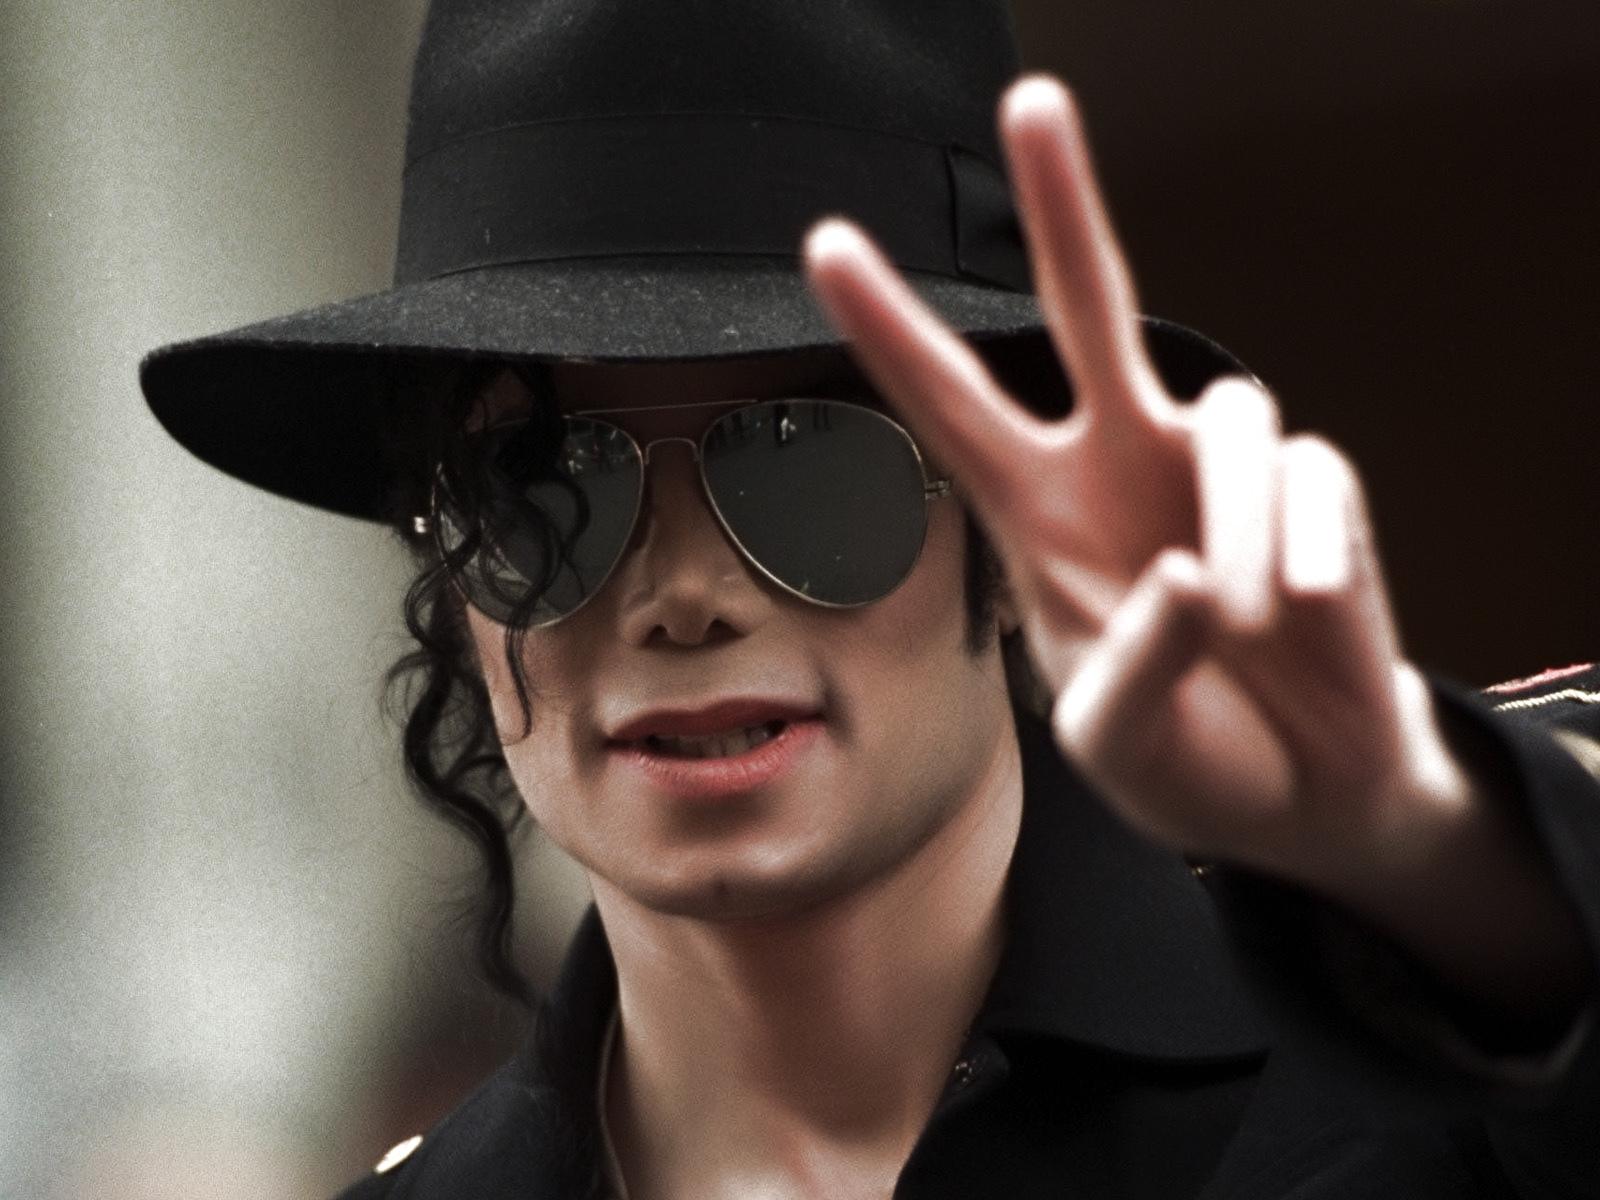 http://4.bp.blogspot.com/-TSej51_ca18/T74OVB5B3bI/AAAAAAAAADo/ShM-4_5fNr8/s1600/Hold-My-Hand-by-Michael-Jackson.jpg